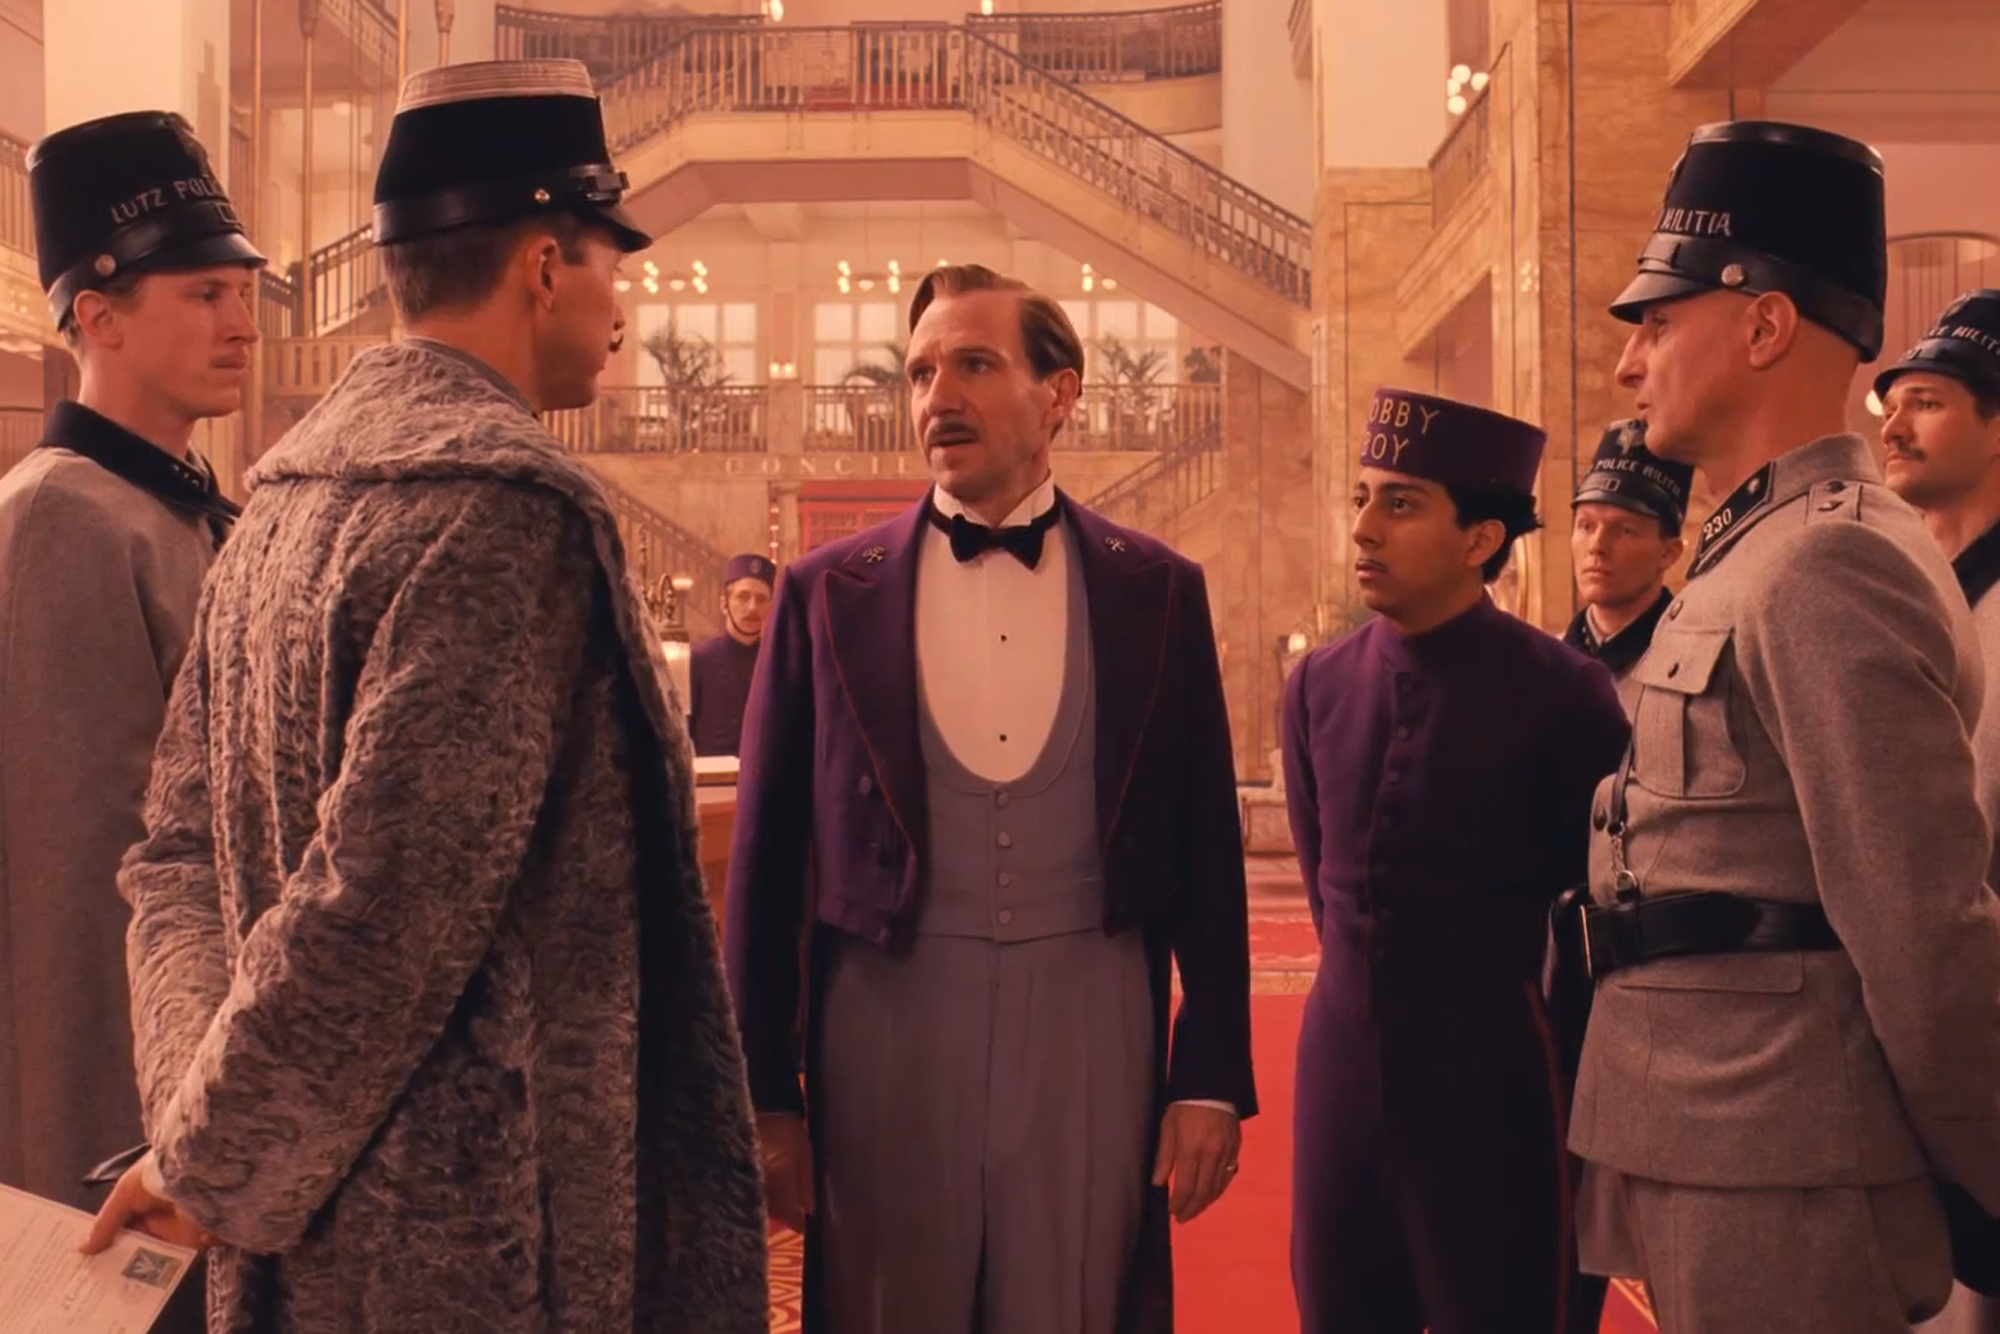 Ralph Fiennes, Edward Norton and Tony Revolori star in 'The Grand Budapest Hotel'.